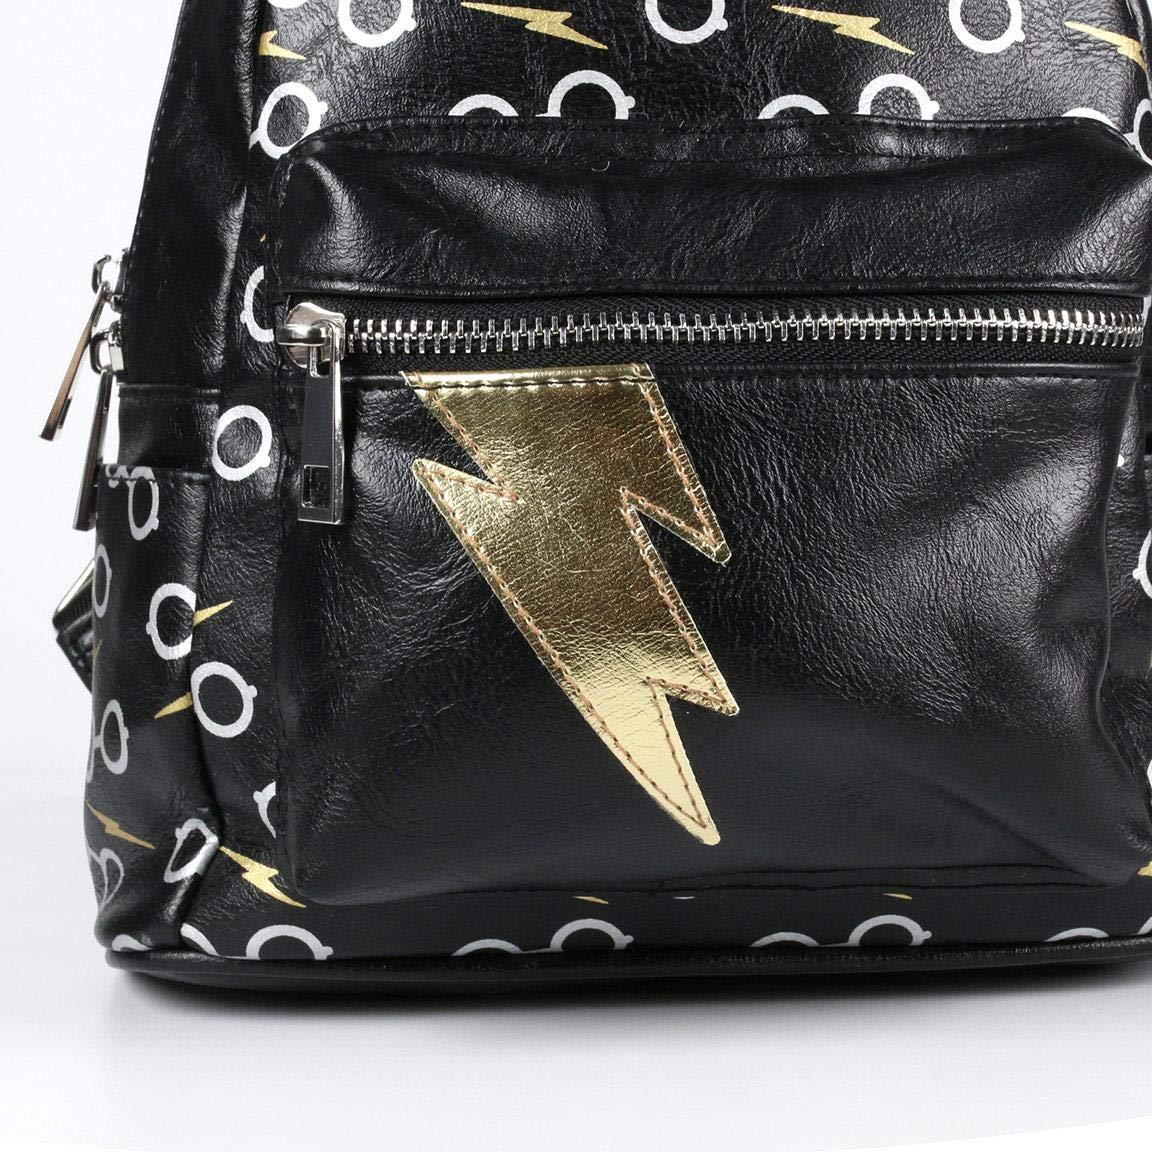 Mochila Mujer Inspirada en Harry Potter/ Bolso Estilo Casual con Licencia Oficial/Bolso Mochila de Moda 25cm, Medidas 25 x 22 x 11,5 cm Color Negro: ...